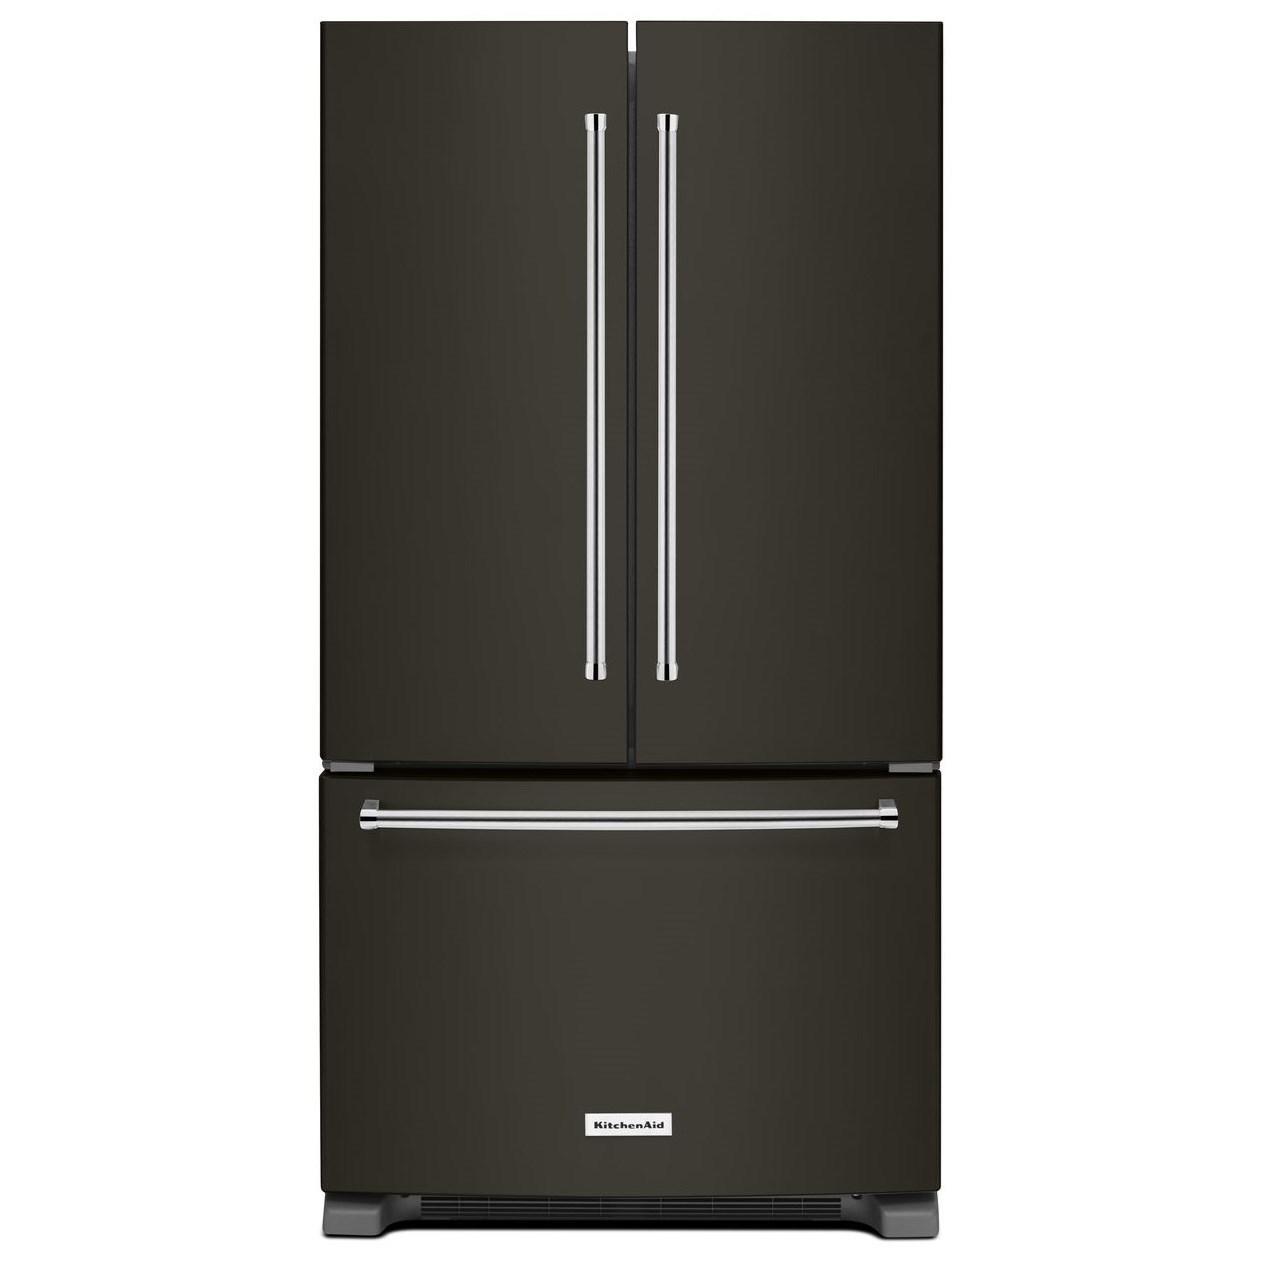 KitchenAid French Door Refrigerators 20 cu. ft. 36-Inch French Door Refrigerator by KitchenAid at Furniture and ApplianceMart